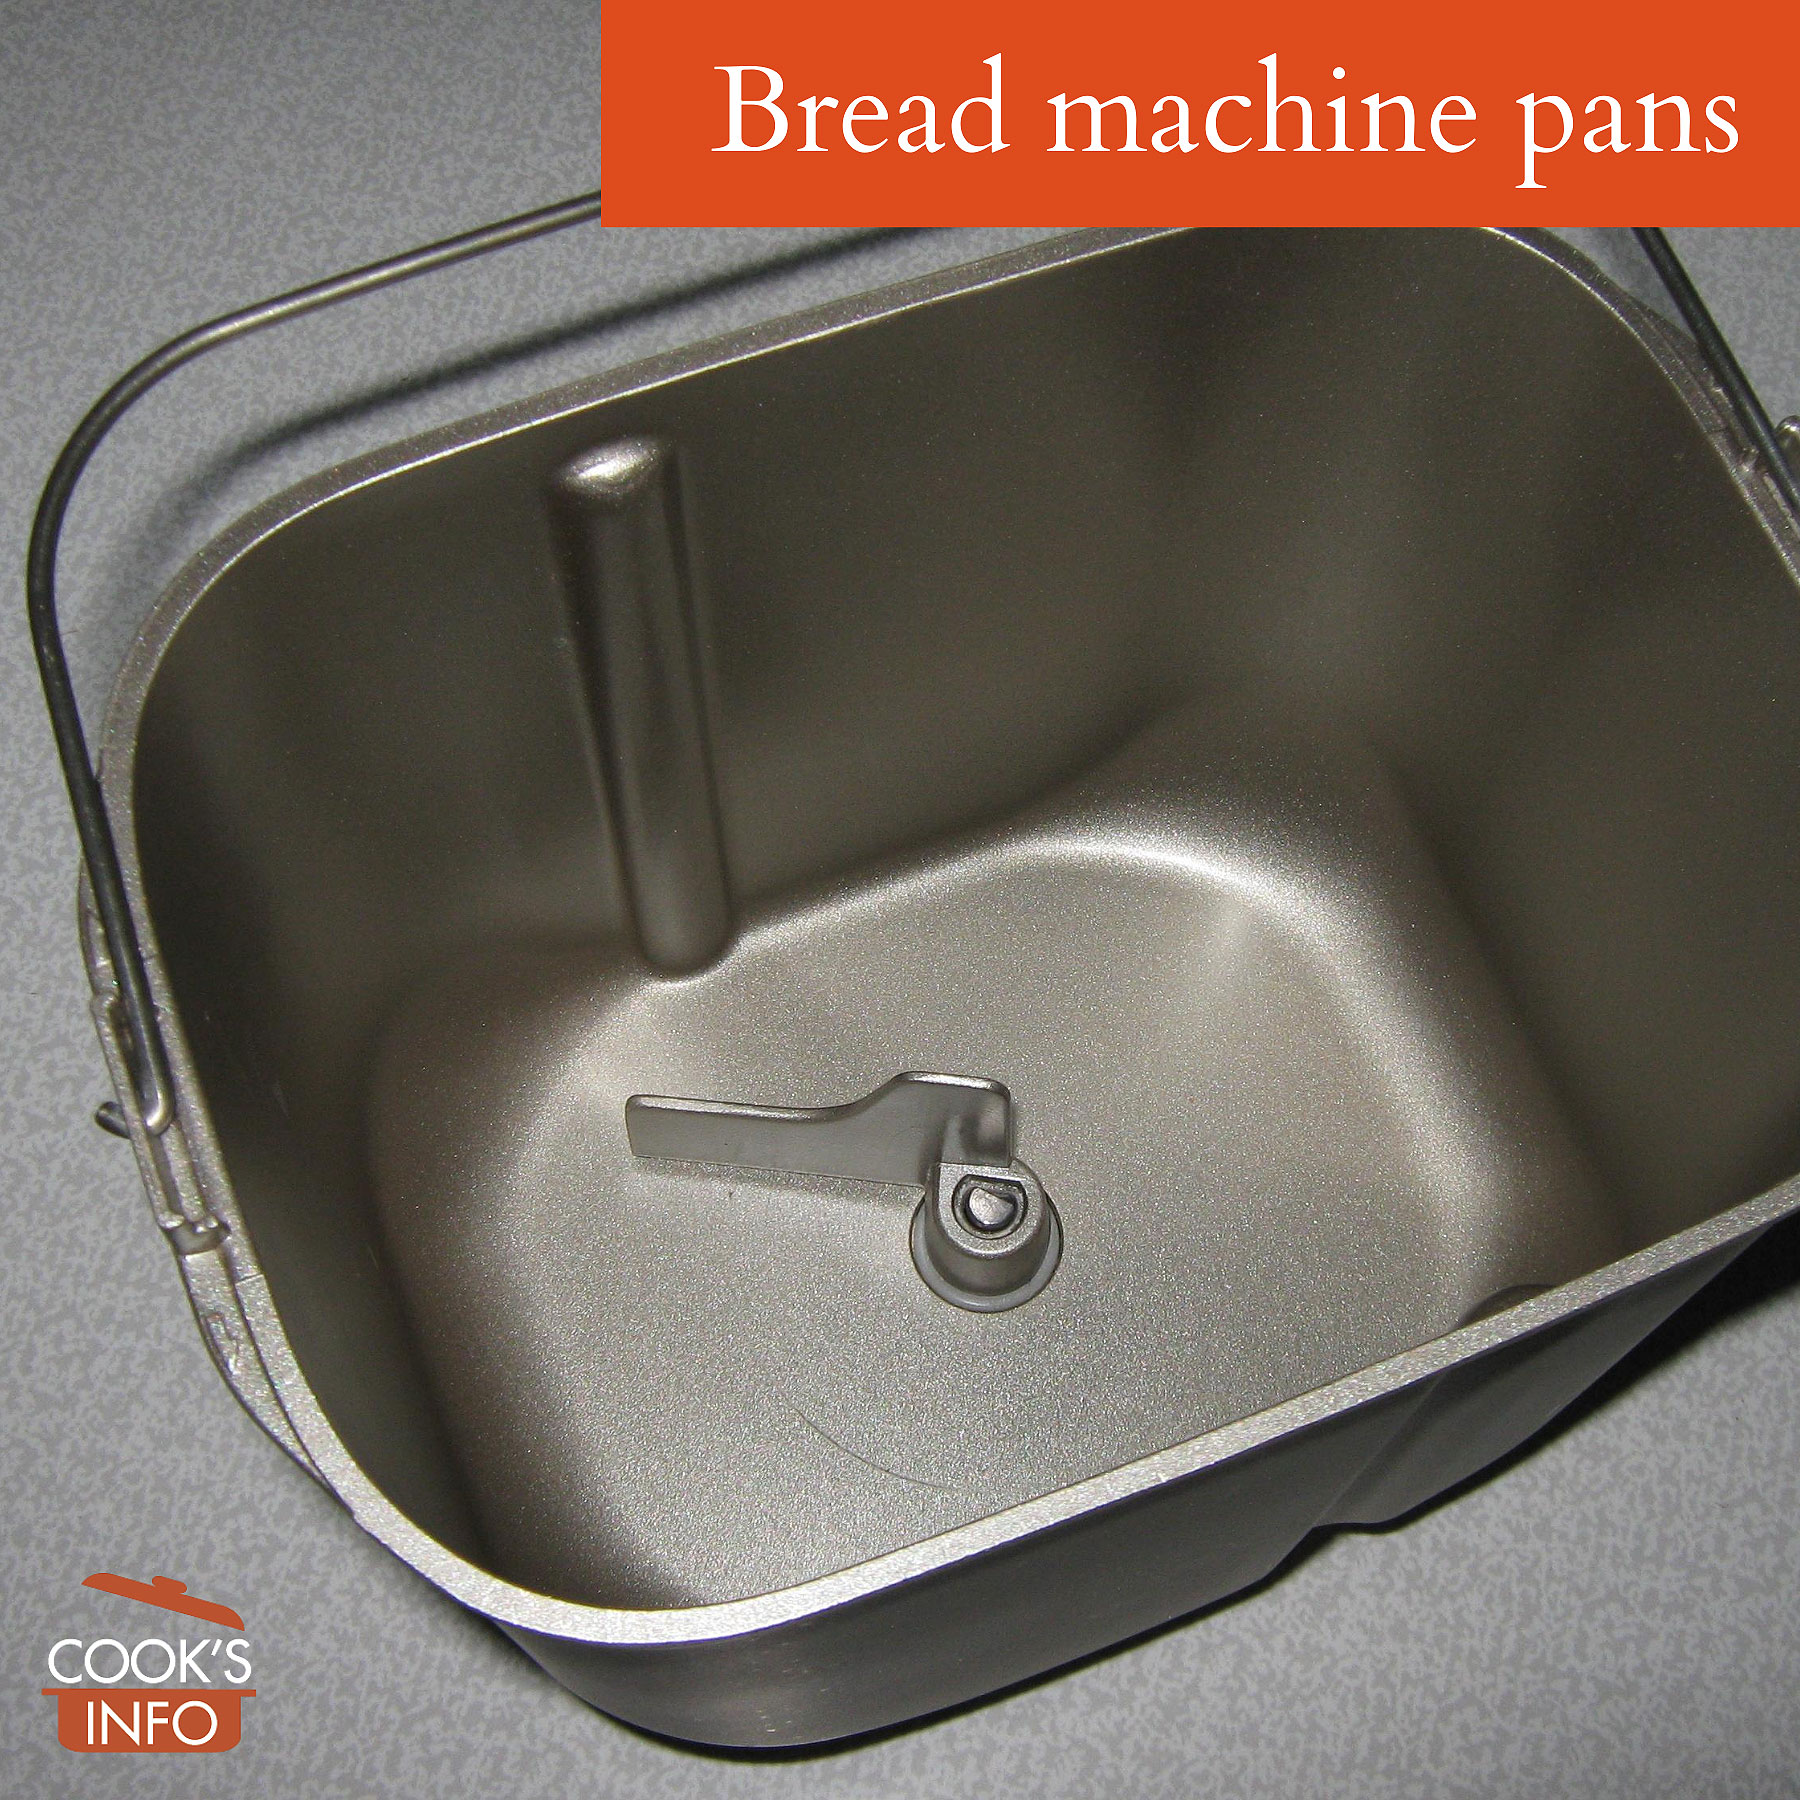 Bread machine pan